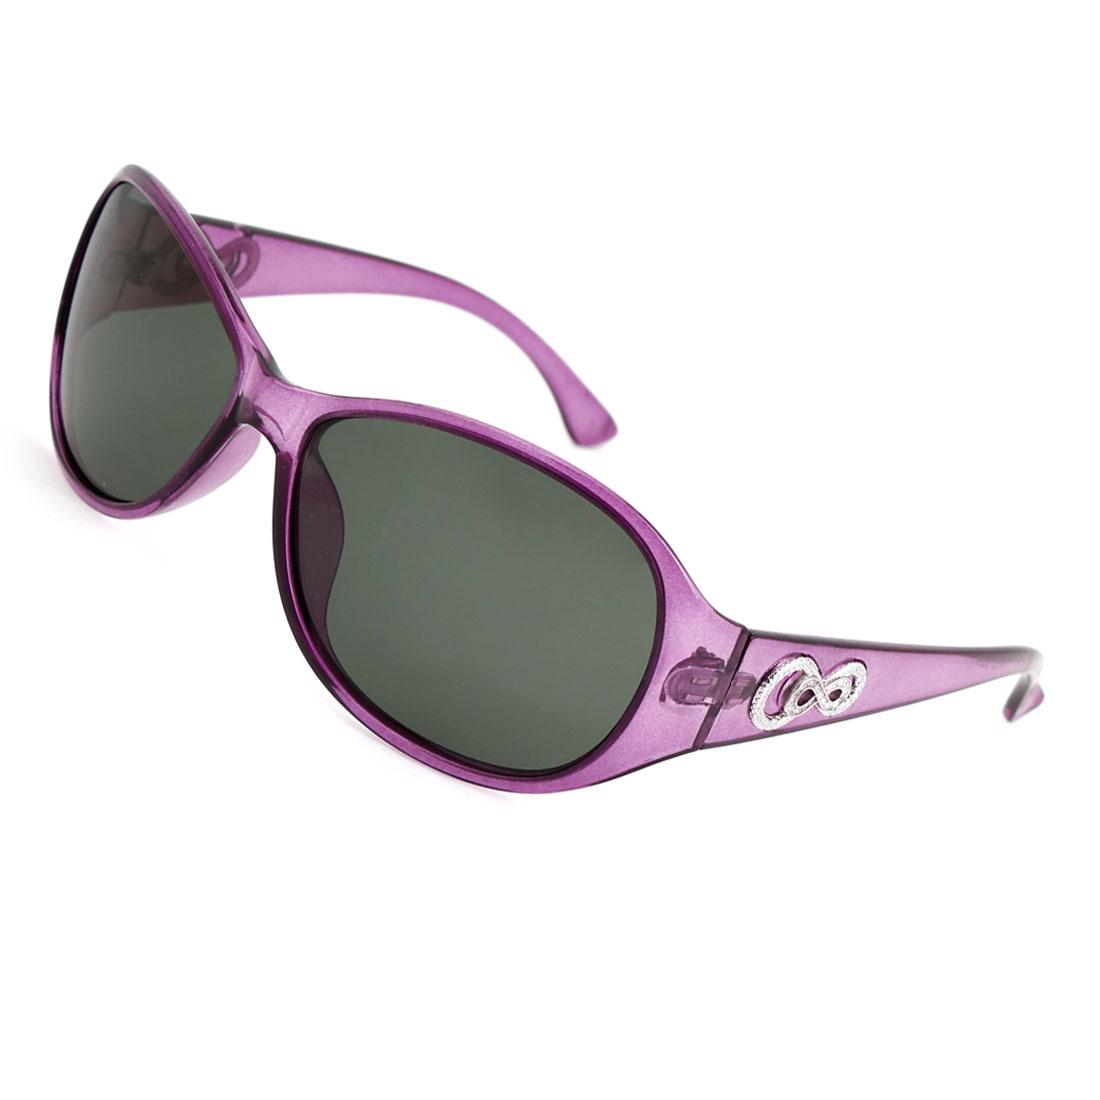 Lady Woman Purple Full Frame Single Bridge Sports Polarized Sunglasses